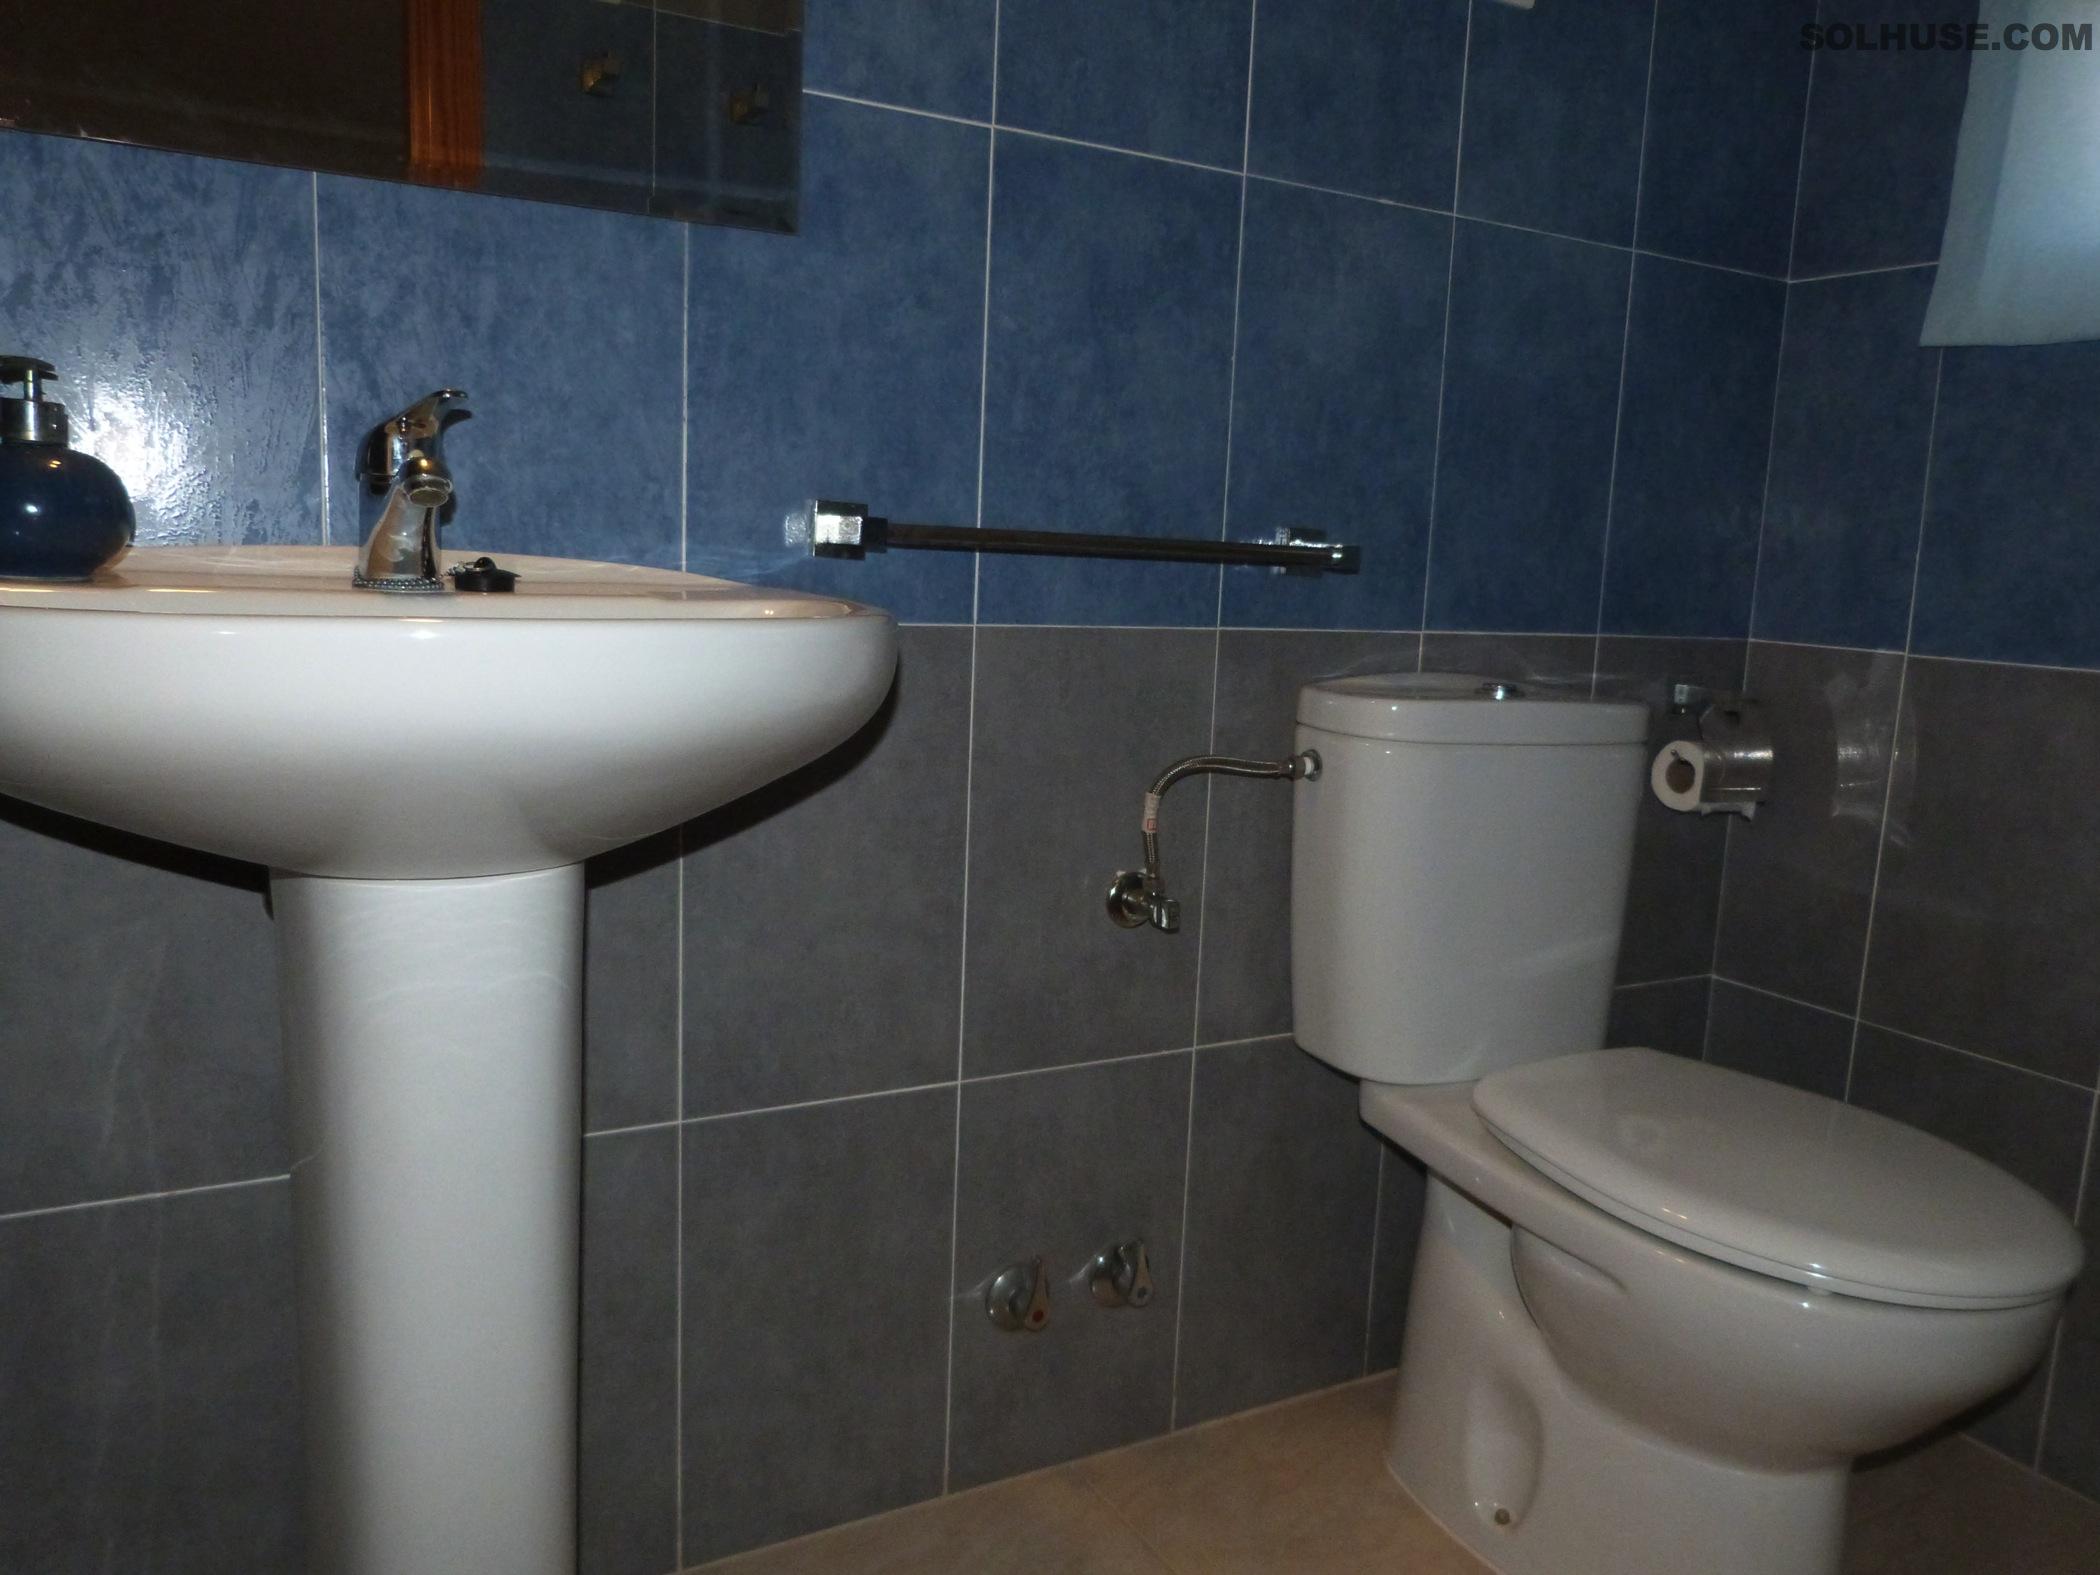 Solhuse - BARGAIN TOWNHOUSE, 2 BEDS, 2 BATHS NEAR ALL AMENITIES